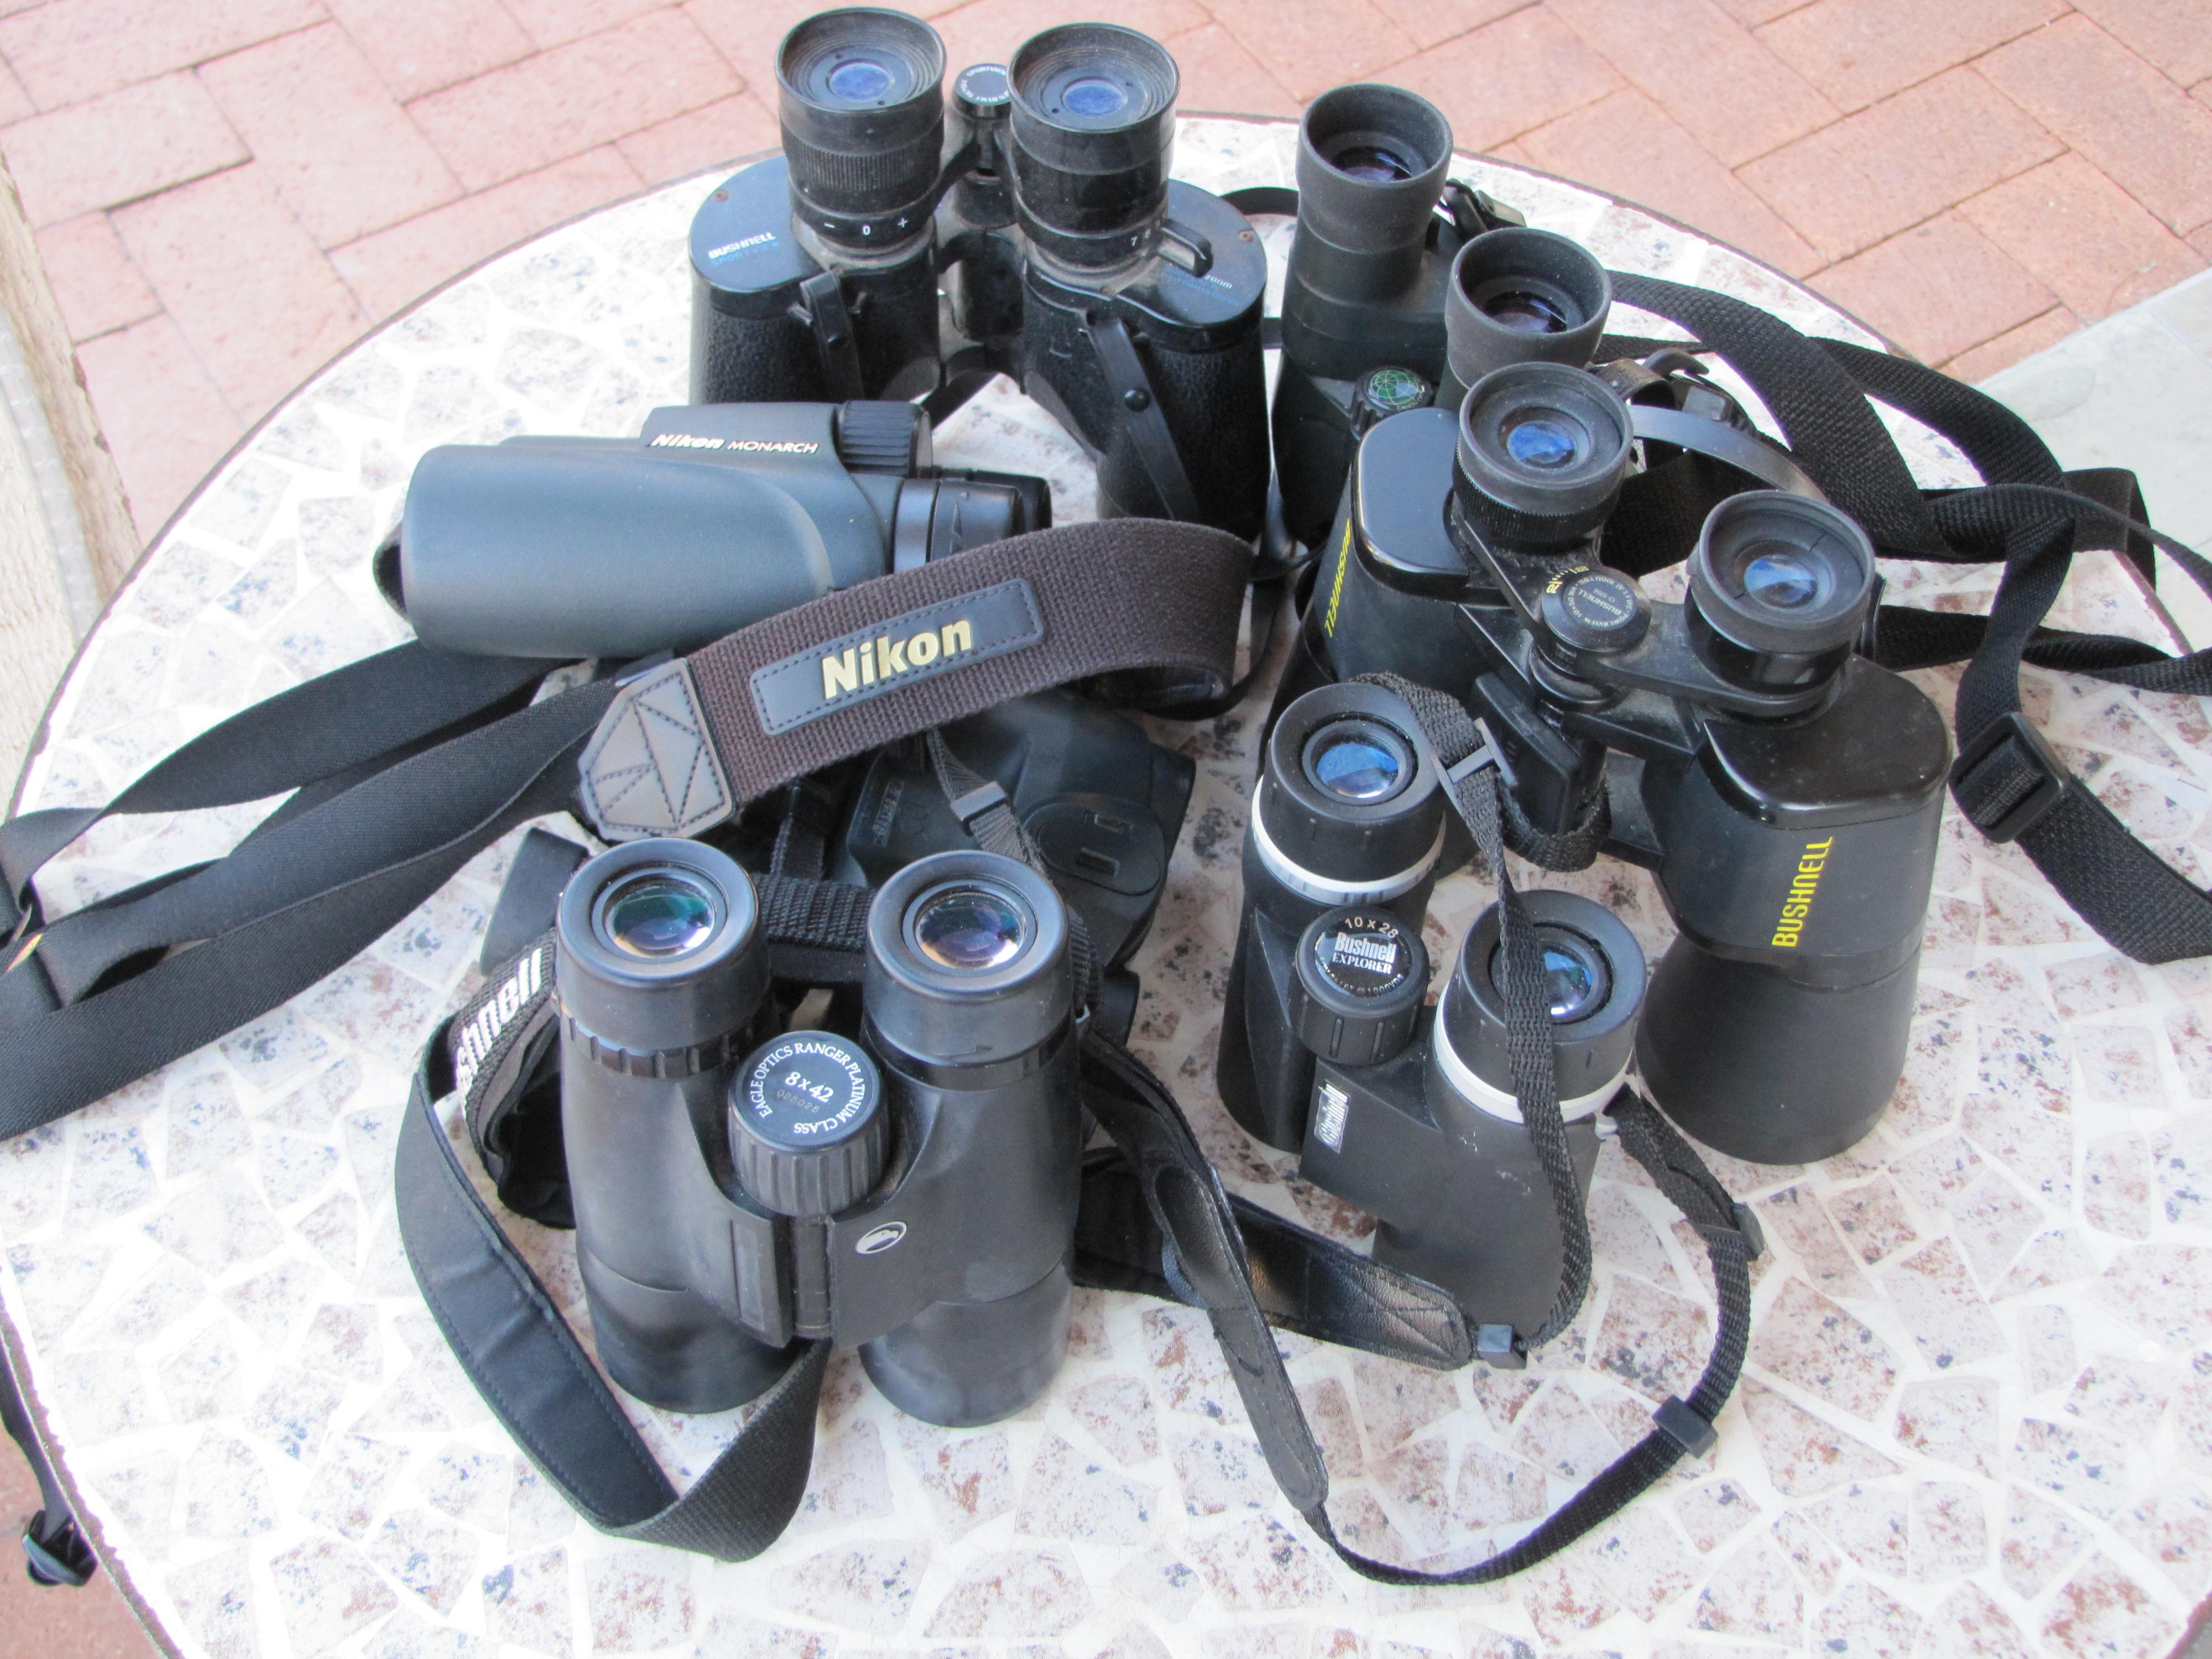 How to Buy Binoculars for Birdwatching